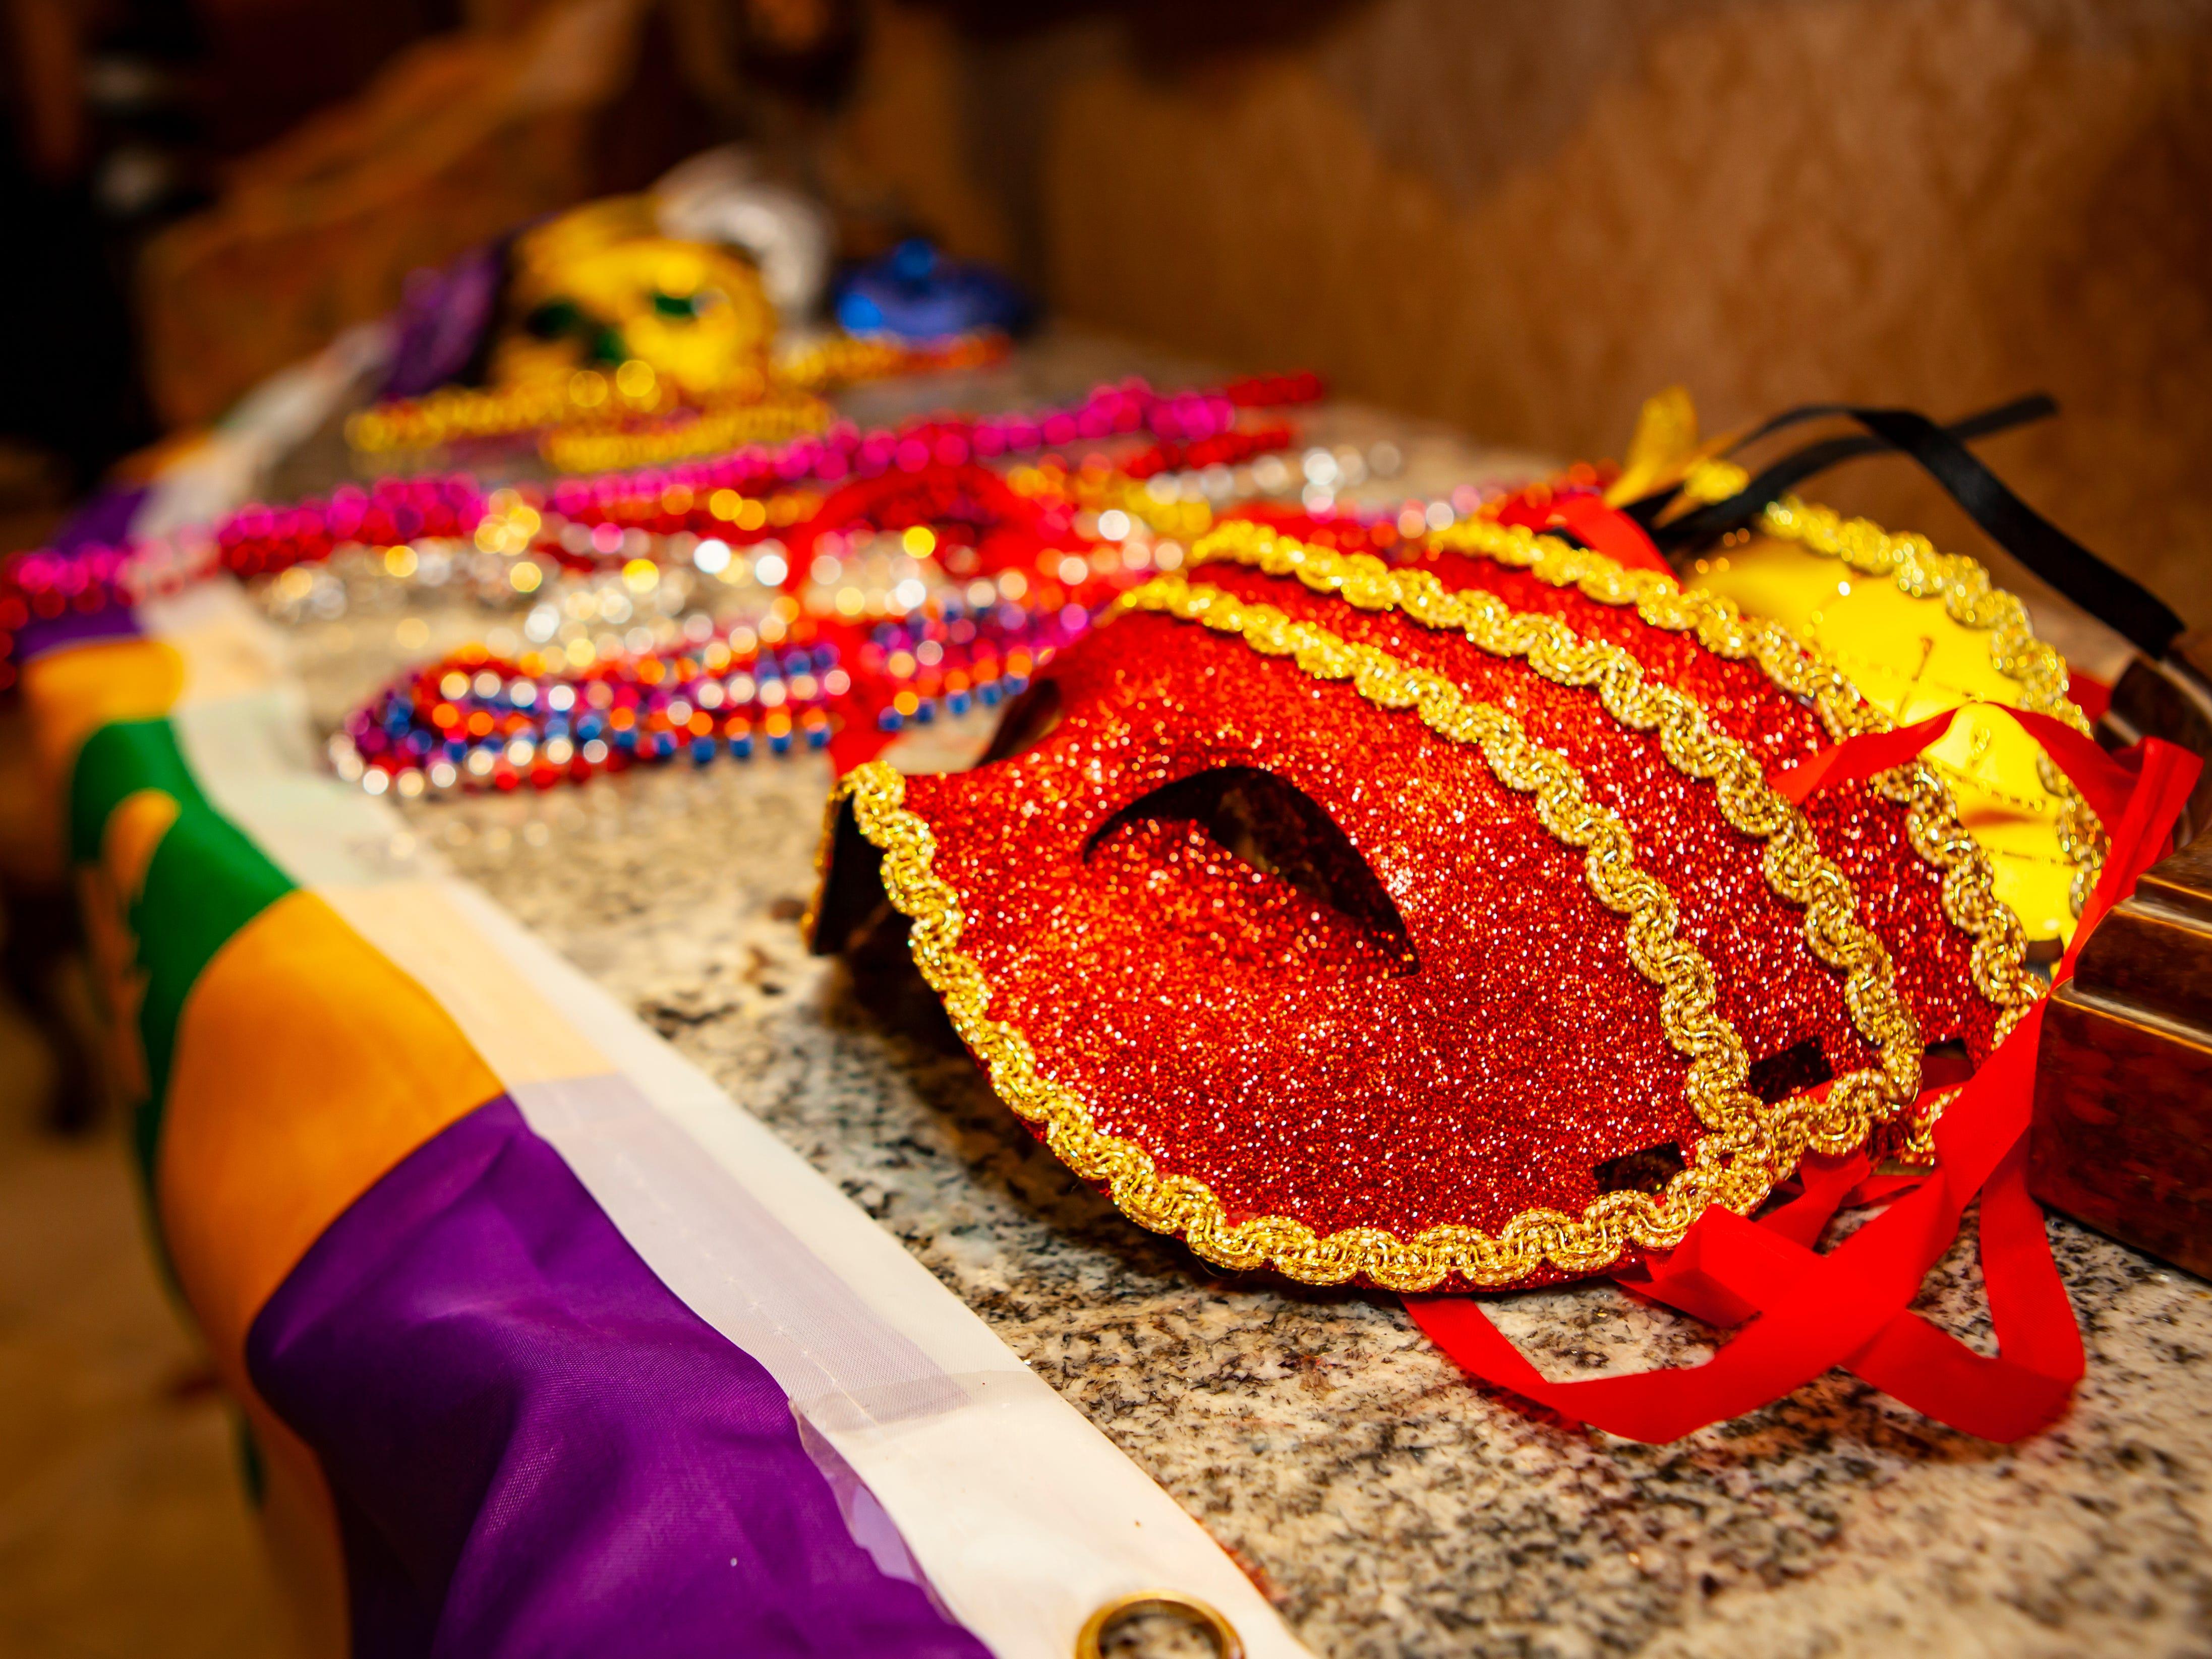 Omega Psi Phi held its annual Mardi Gras Party Saturday, Feb. 9 at Stones River Country Club in Murfreesboro.